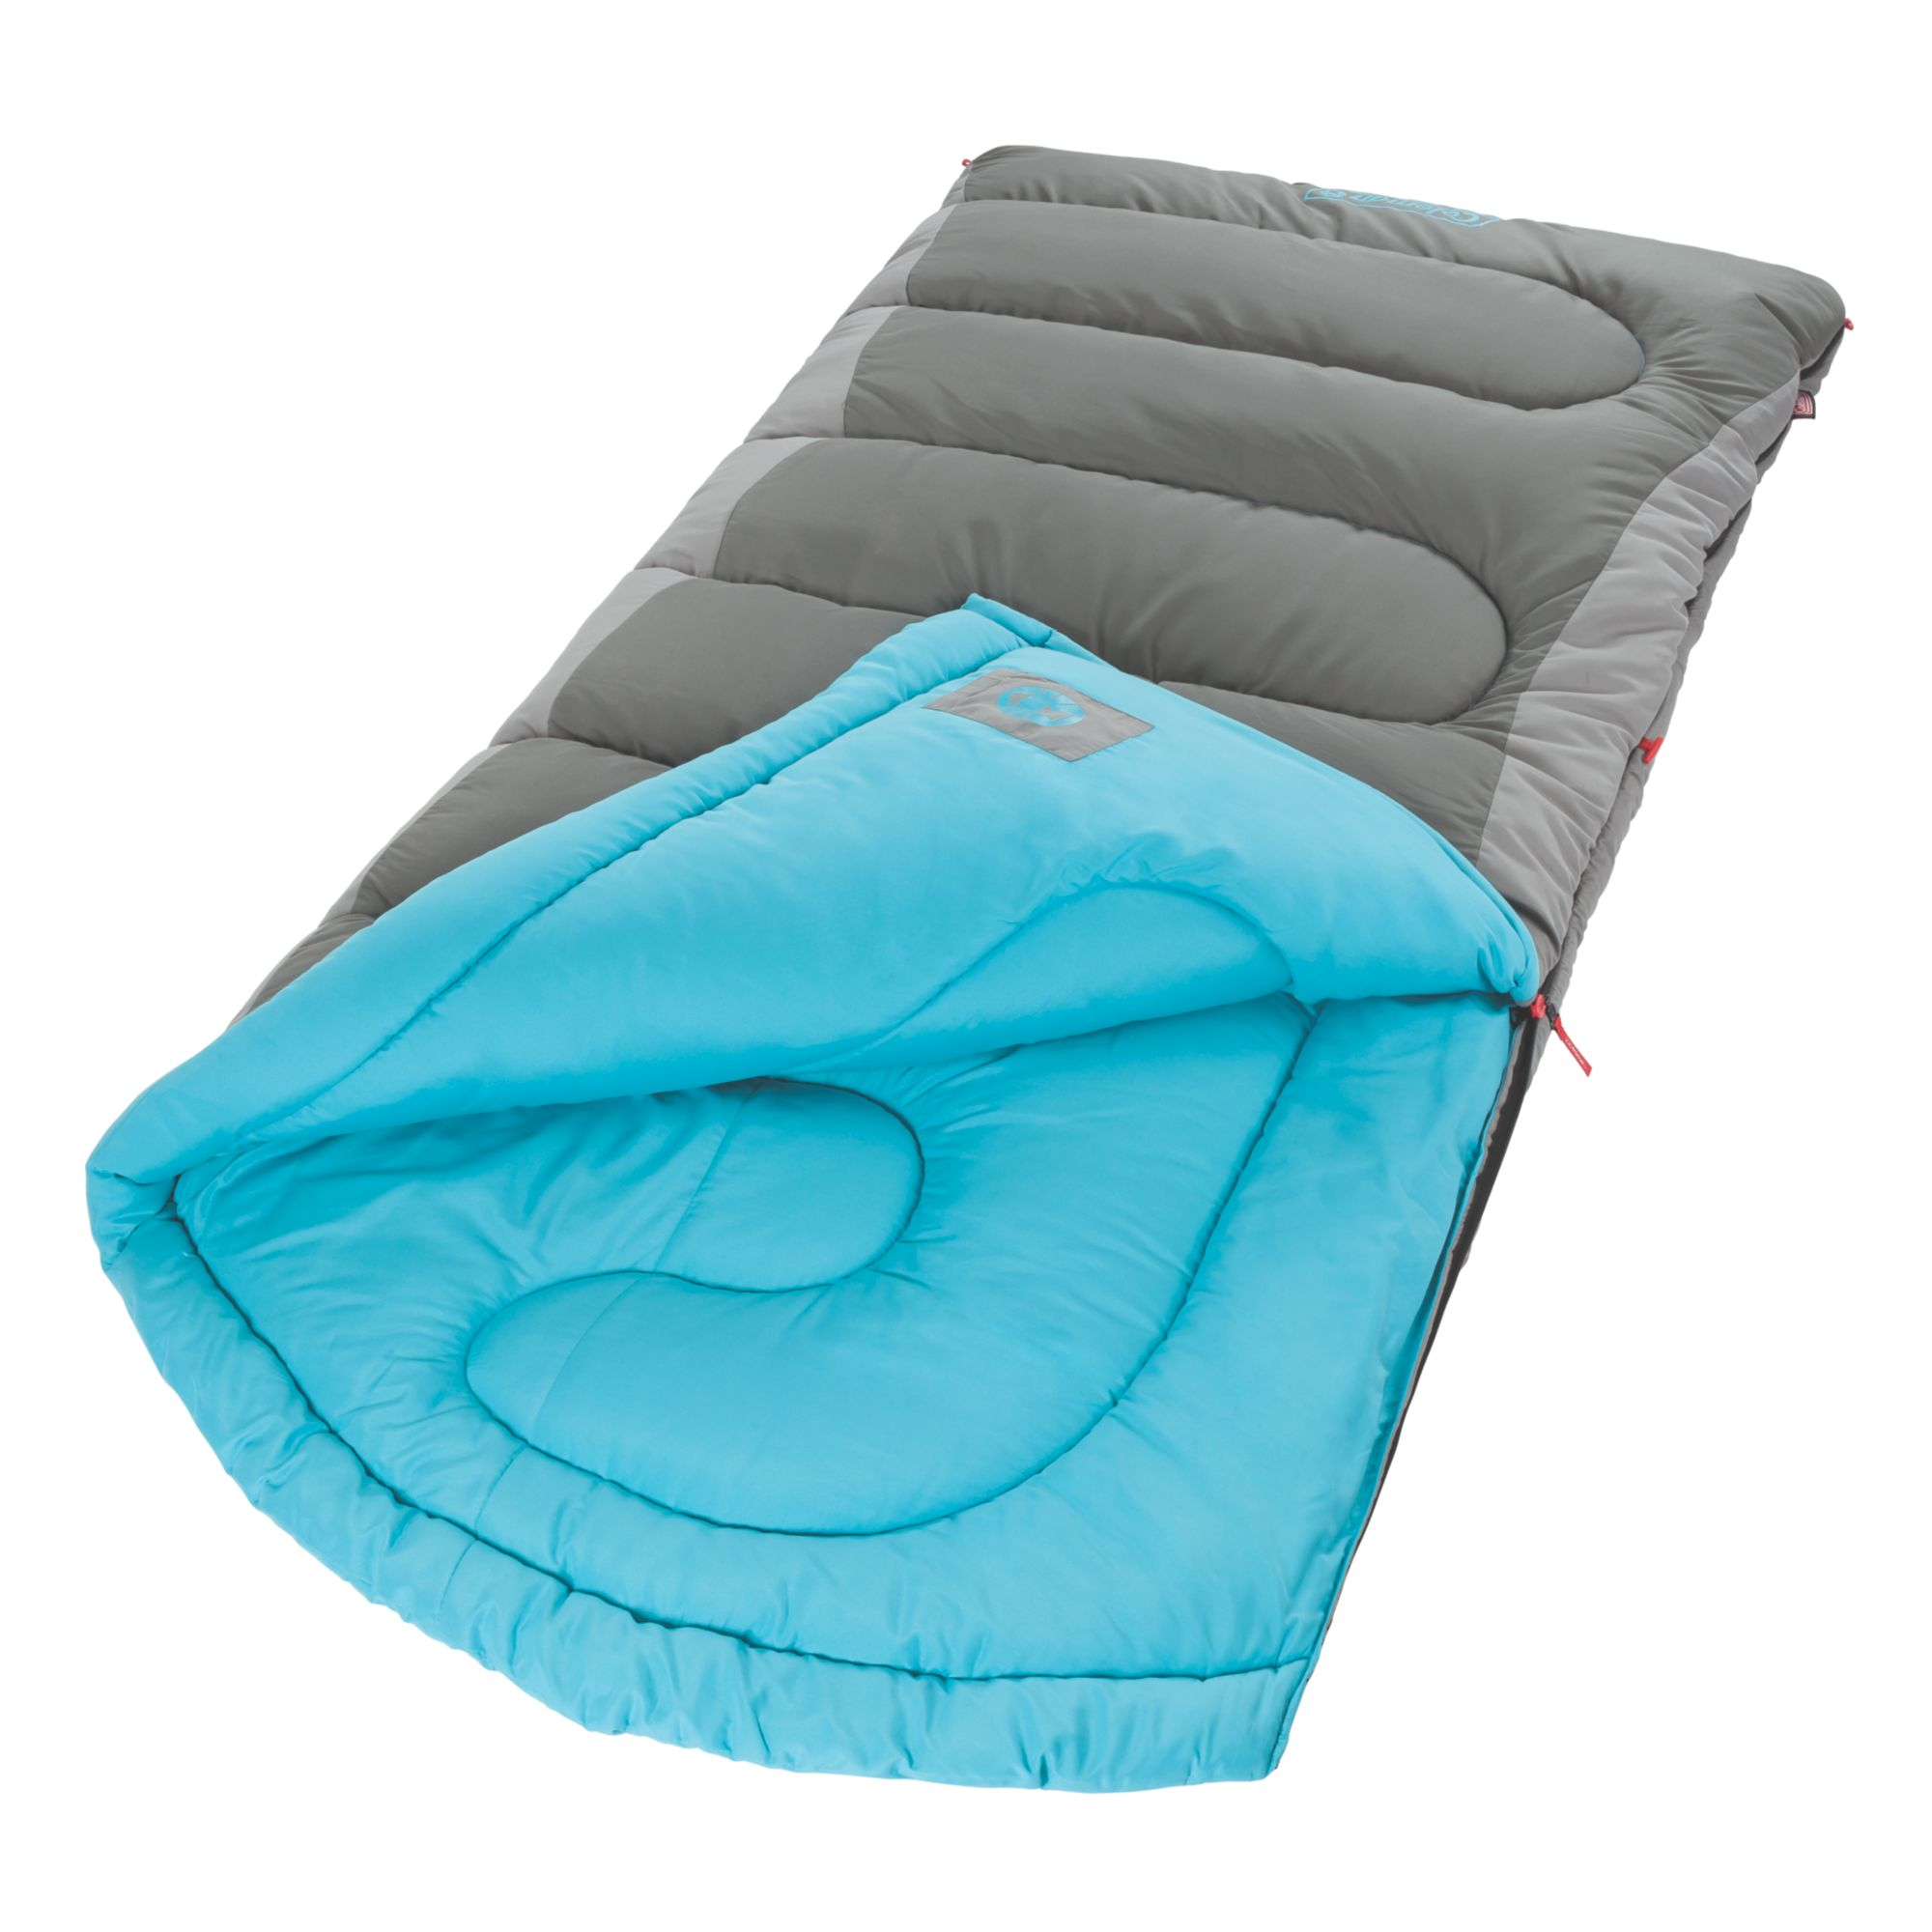 heliotherm save brine water modulating products sensor heat solid product m pump comforter aqua earth manuals comfort sensorcomfort